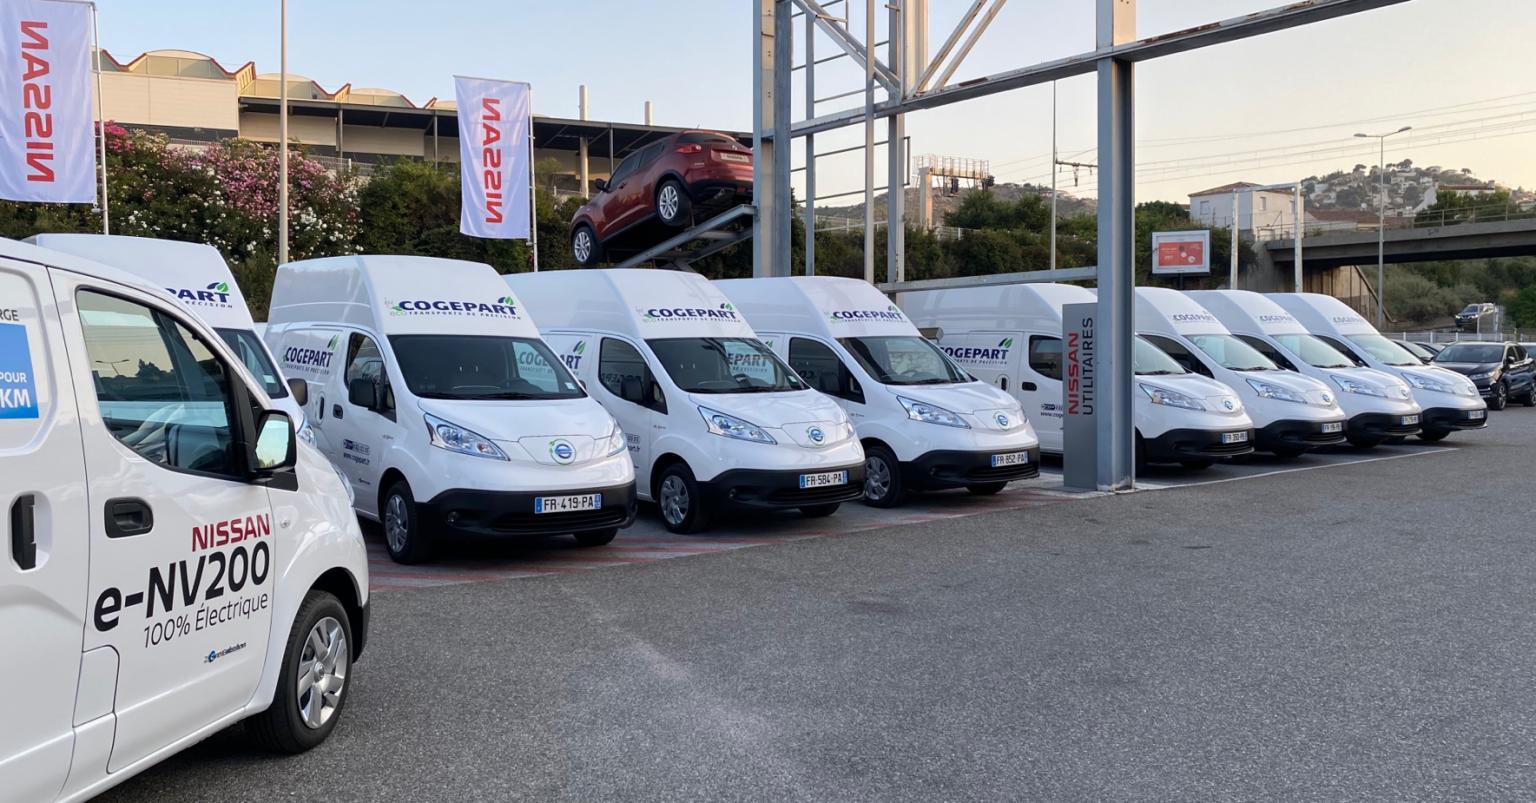 cogerpart1 Στη Μασαλία, τα Nissan e-NV200... επελαύνουν